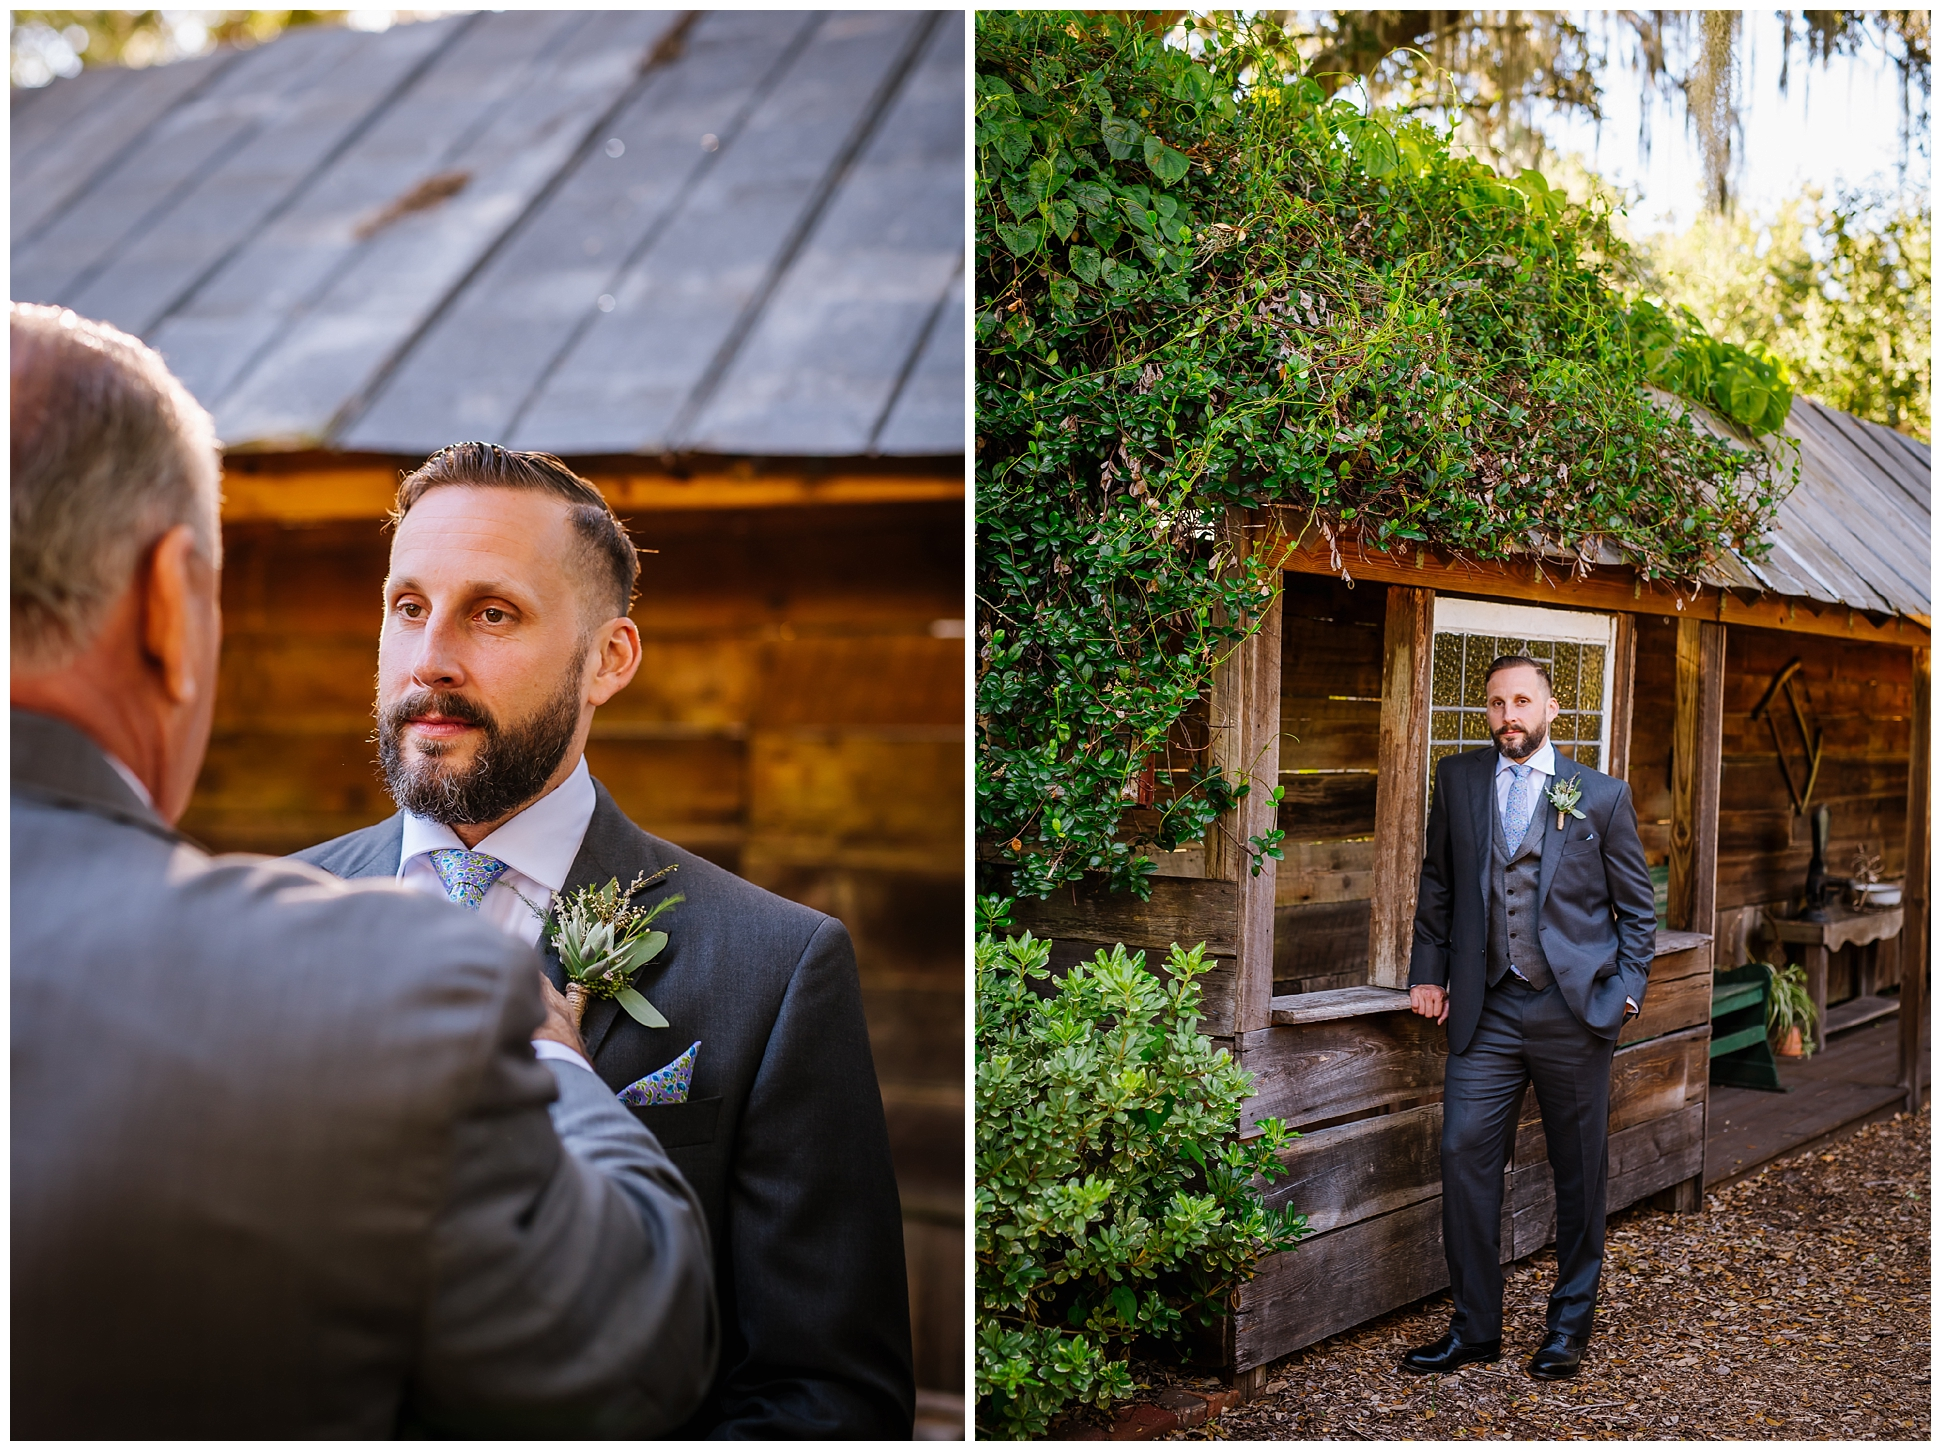 Ashlee-hamon-photography-year-in-review-2016-travel-wanderlust-vsco-adventure-wedding_0099.jpg